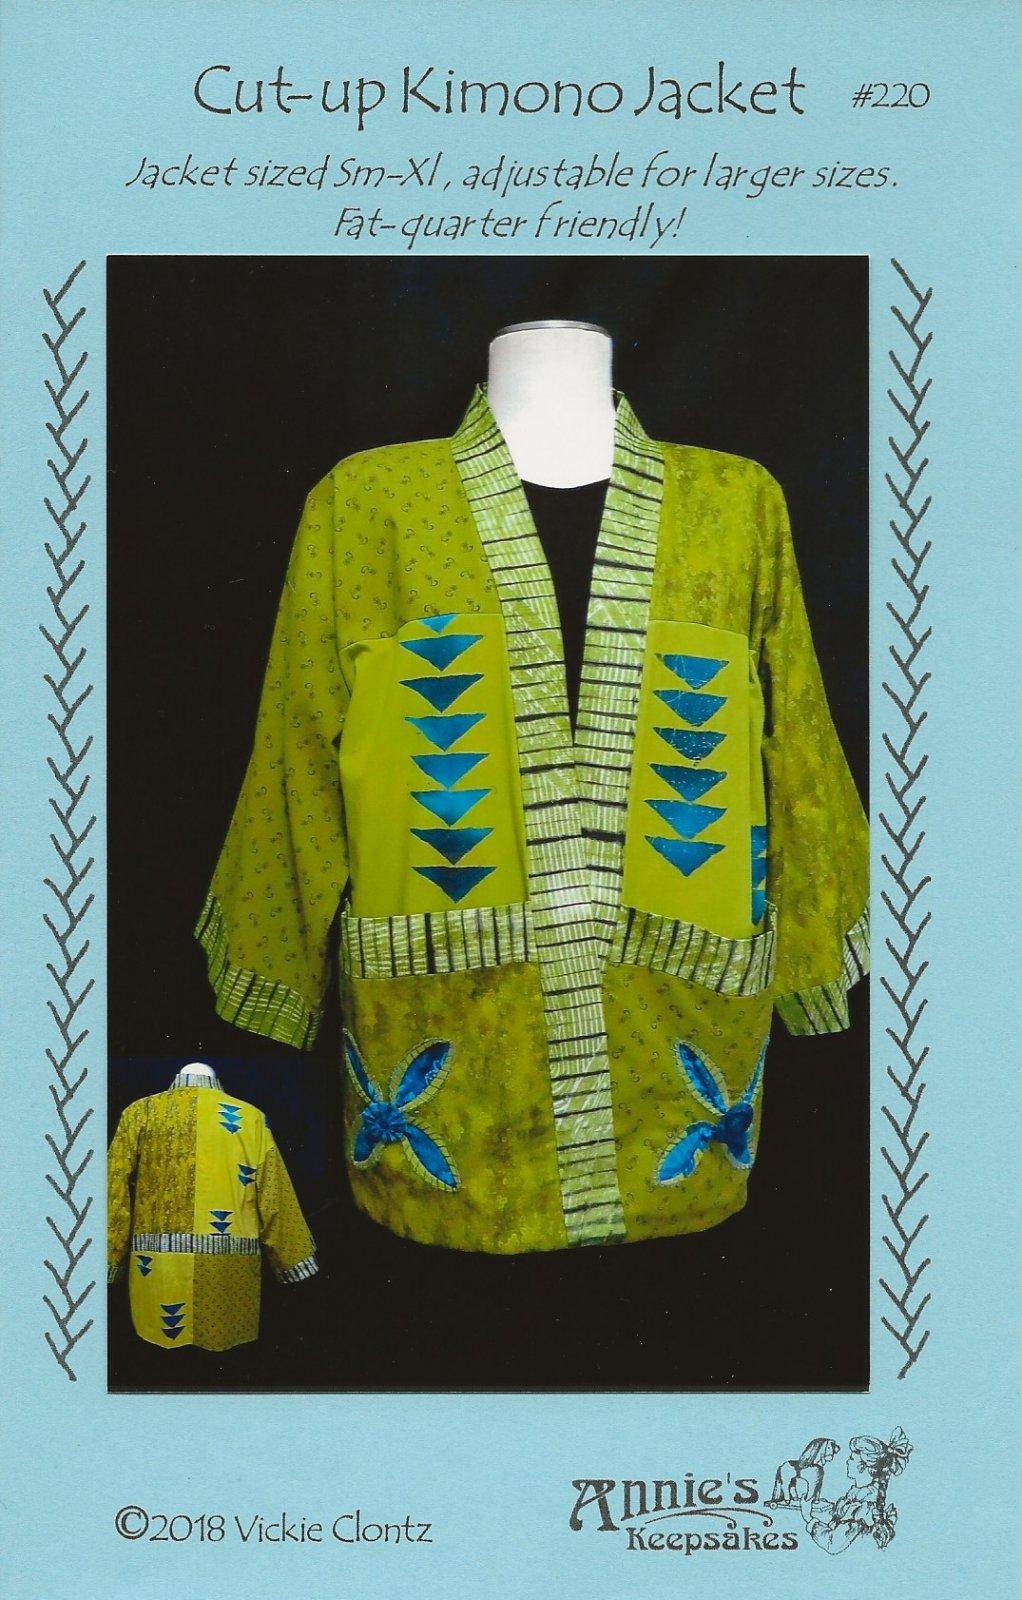 Cut-up Kimono Jacket